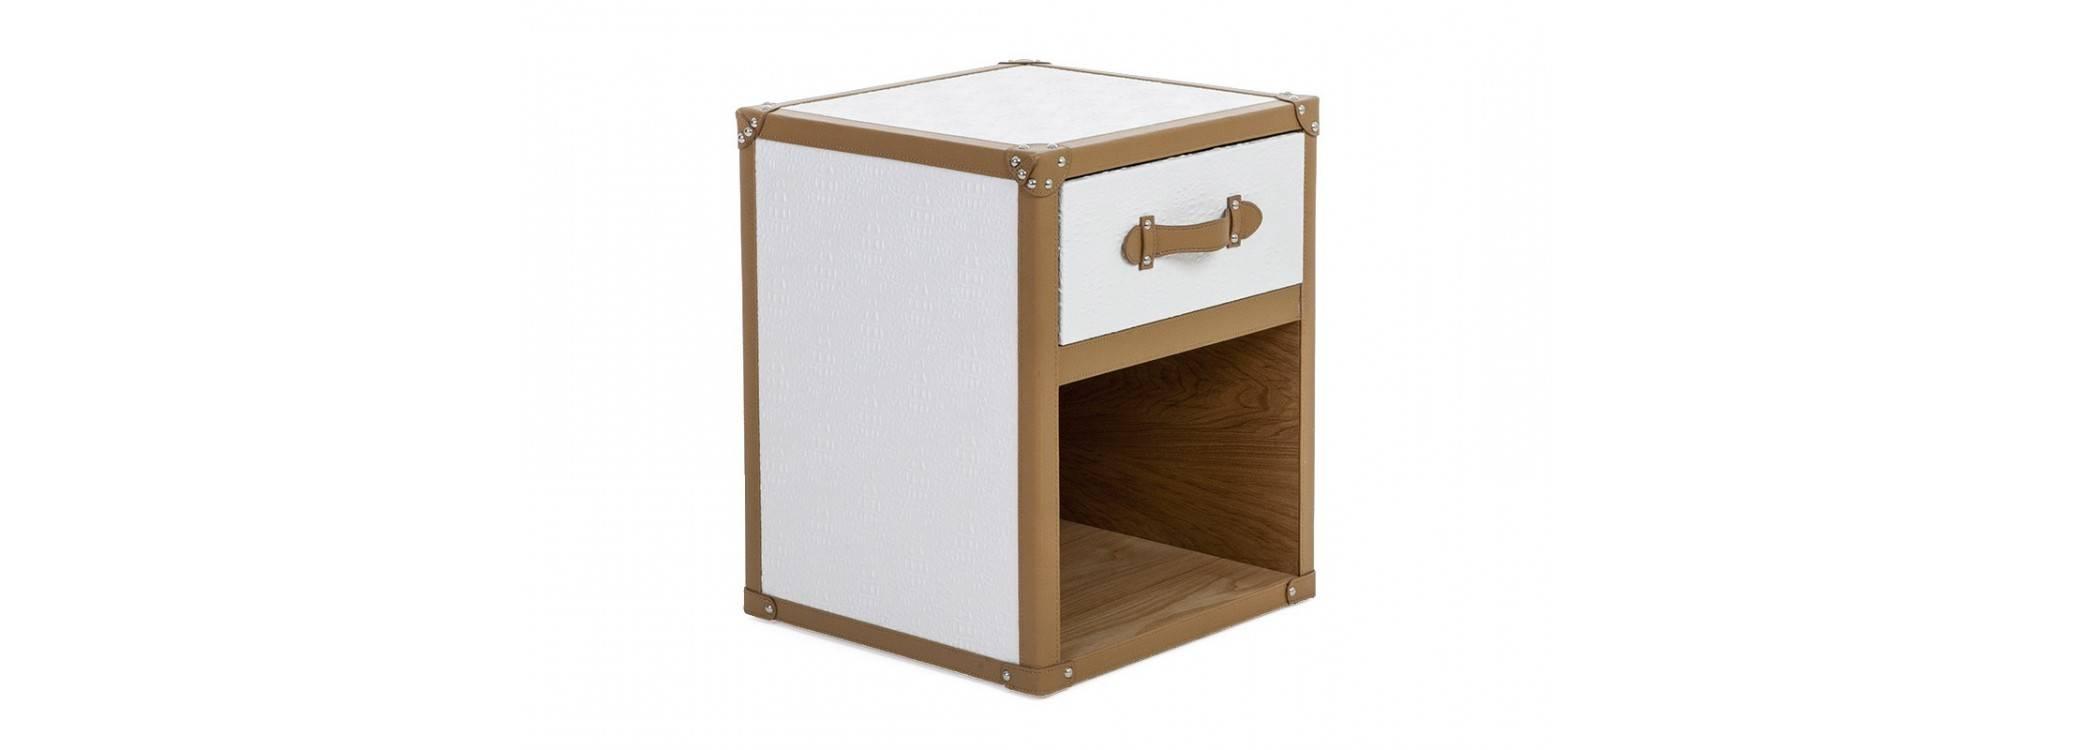 Chevet Cap Horn 1 tiroir - Blanc façon croco